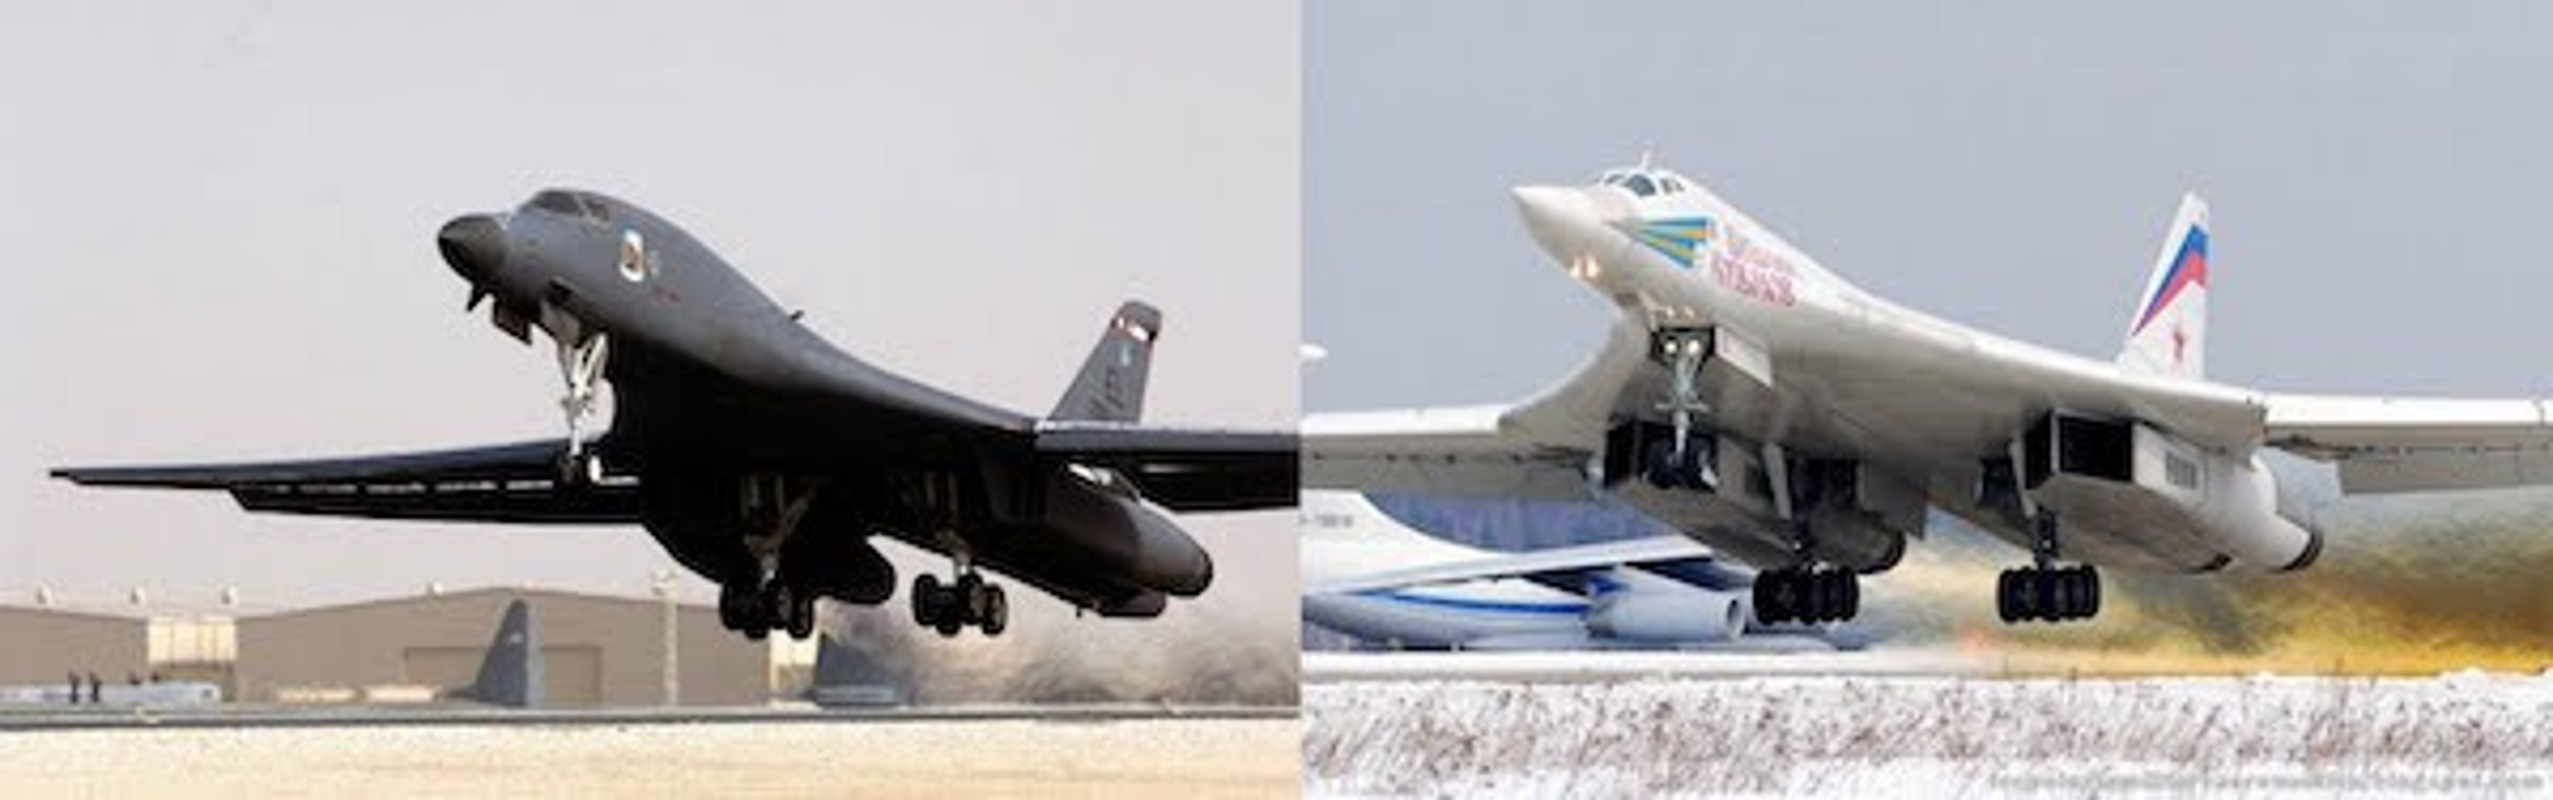 Nghi van may bay Tu-160 cua Lien Xo sao chep B-1 cua My-Hinh-4